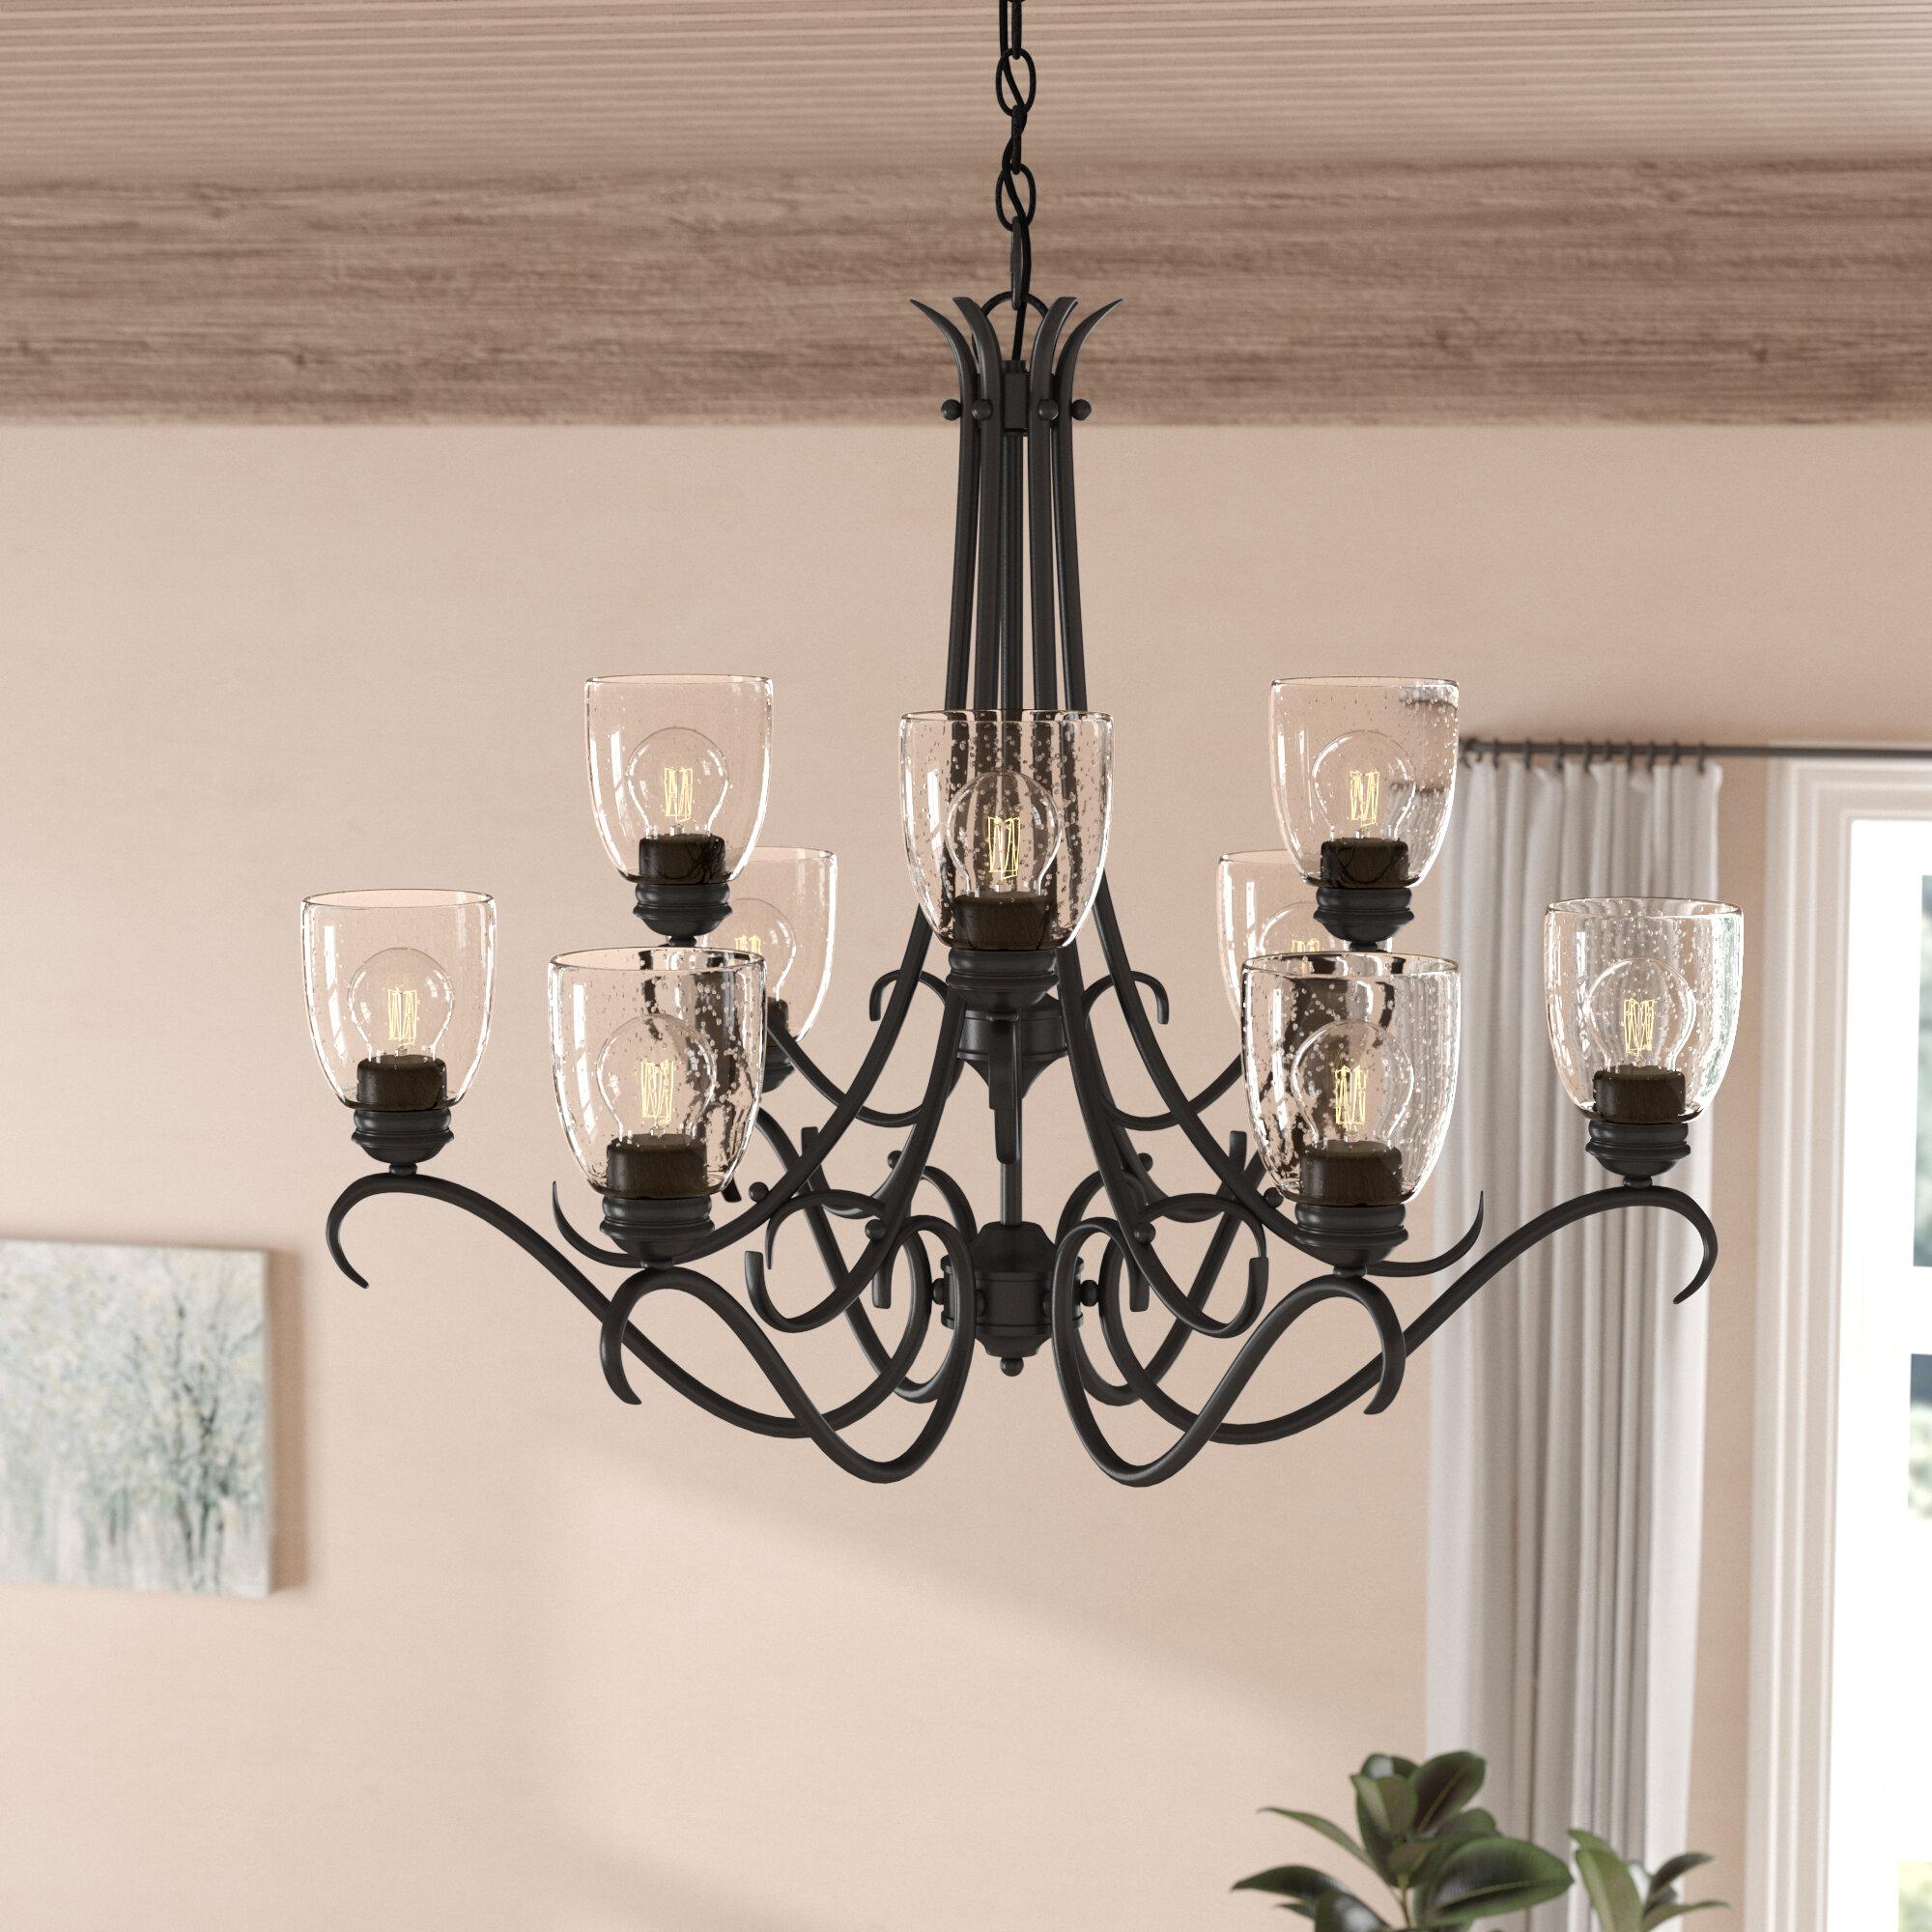 Laurel foundry modern farmhouse sheila 9 light shaded chandelier reviews wayfair ca